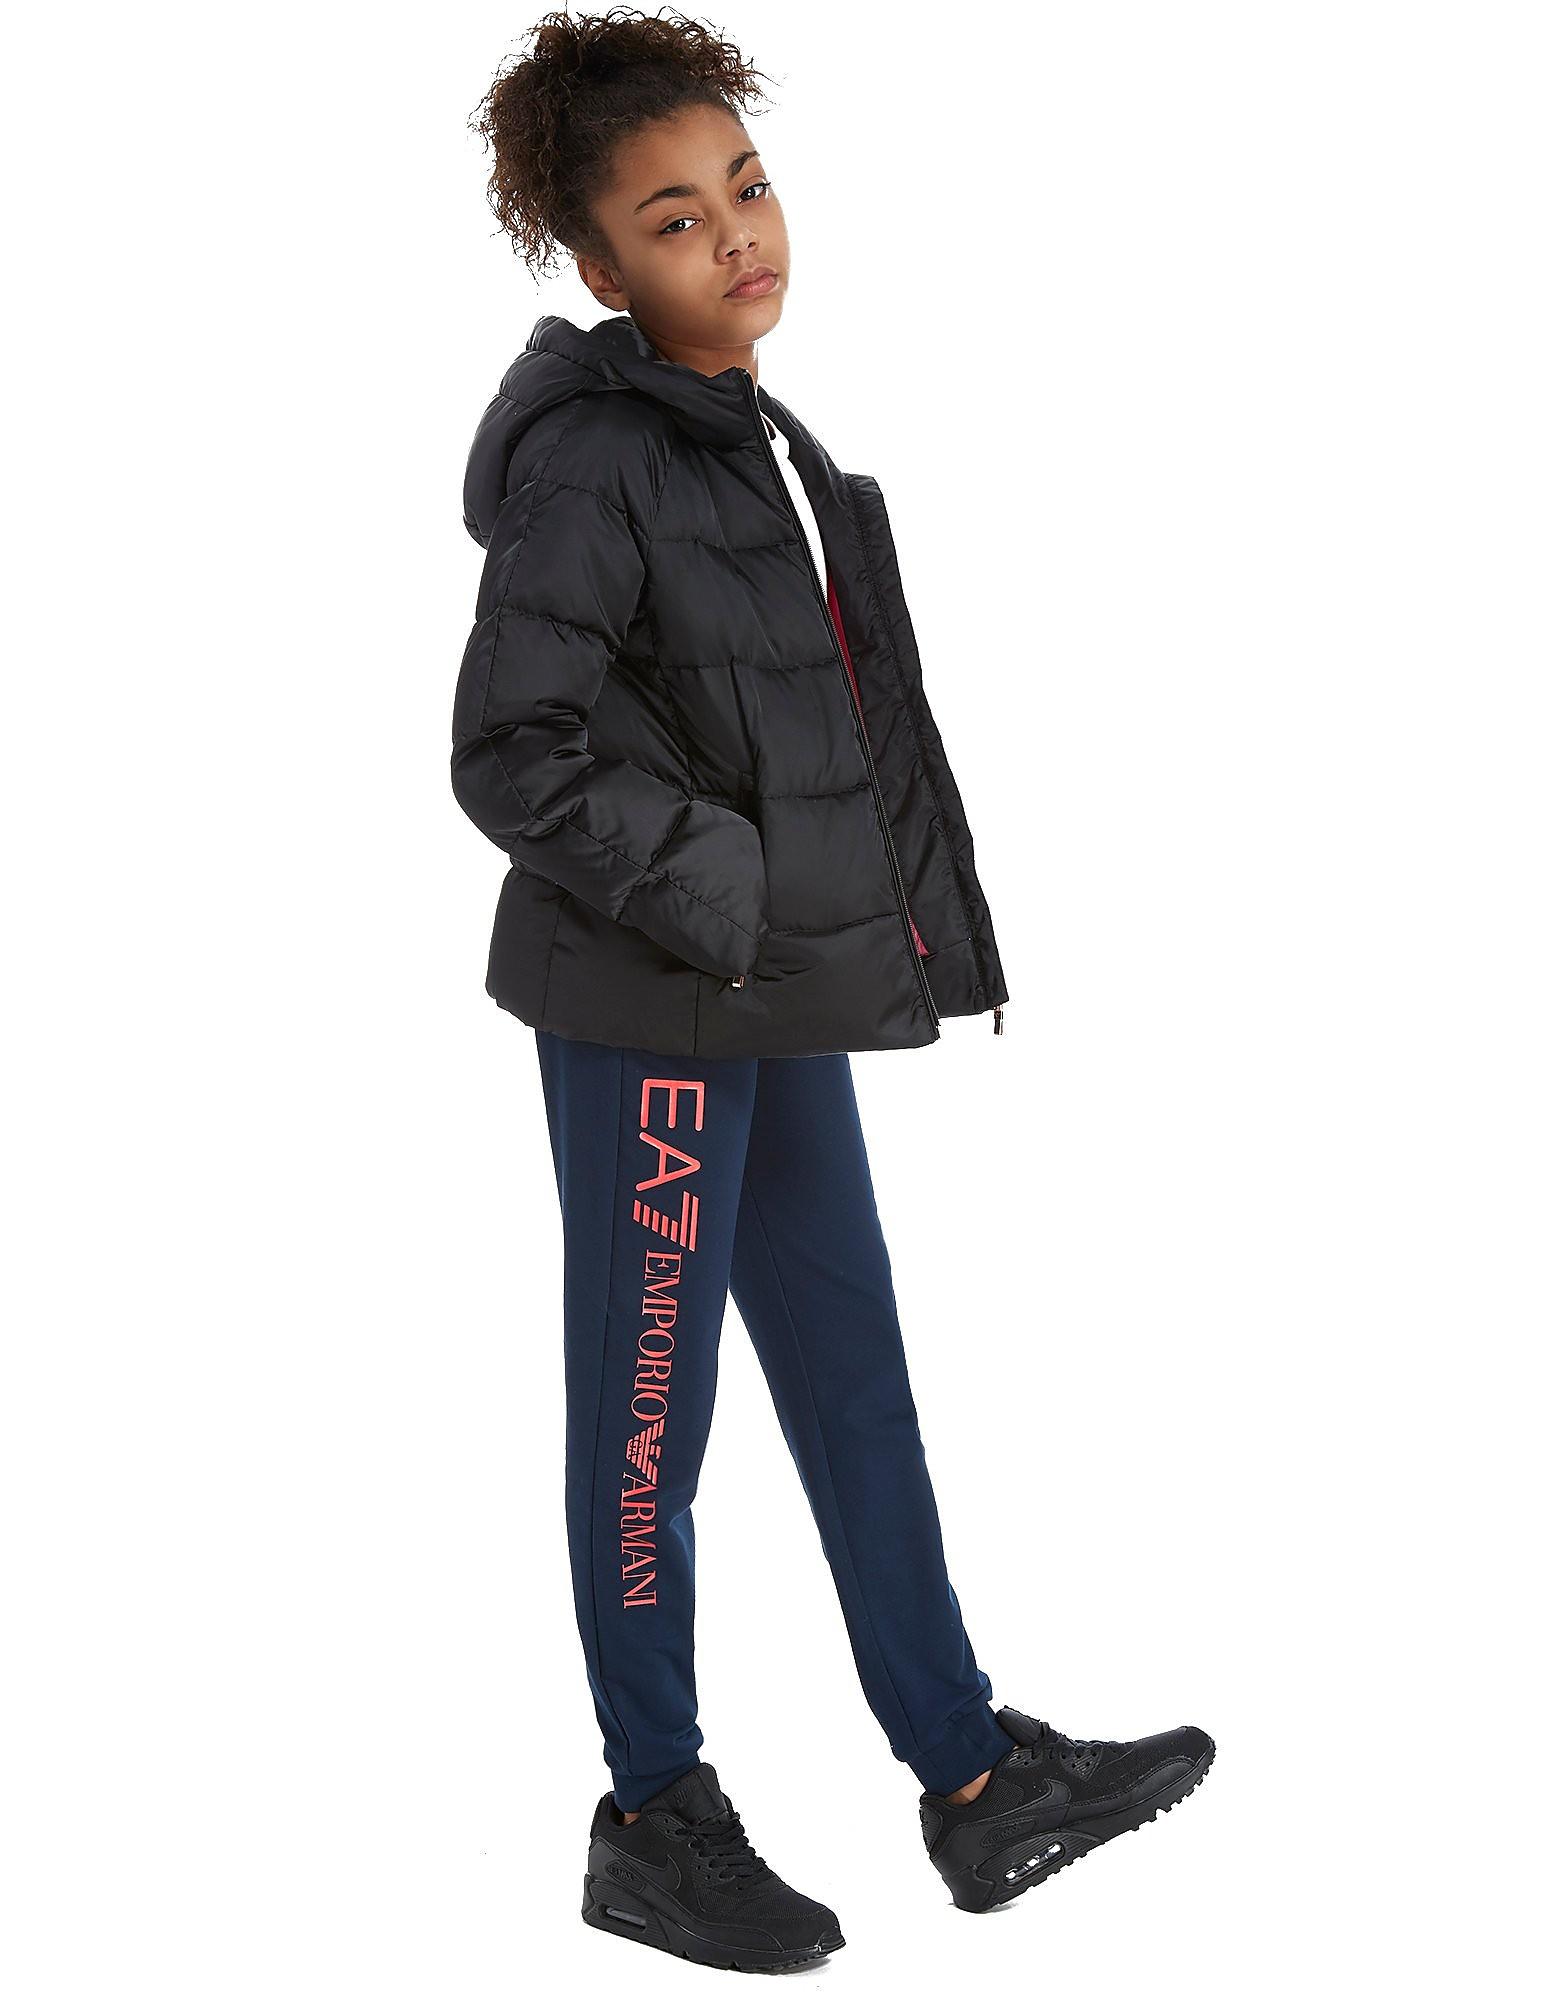 Emporio Armani EA7 Girls' Shiny Down Jacket Junior